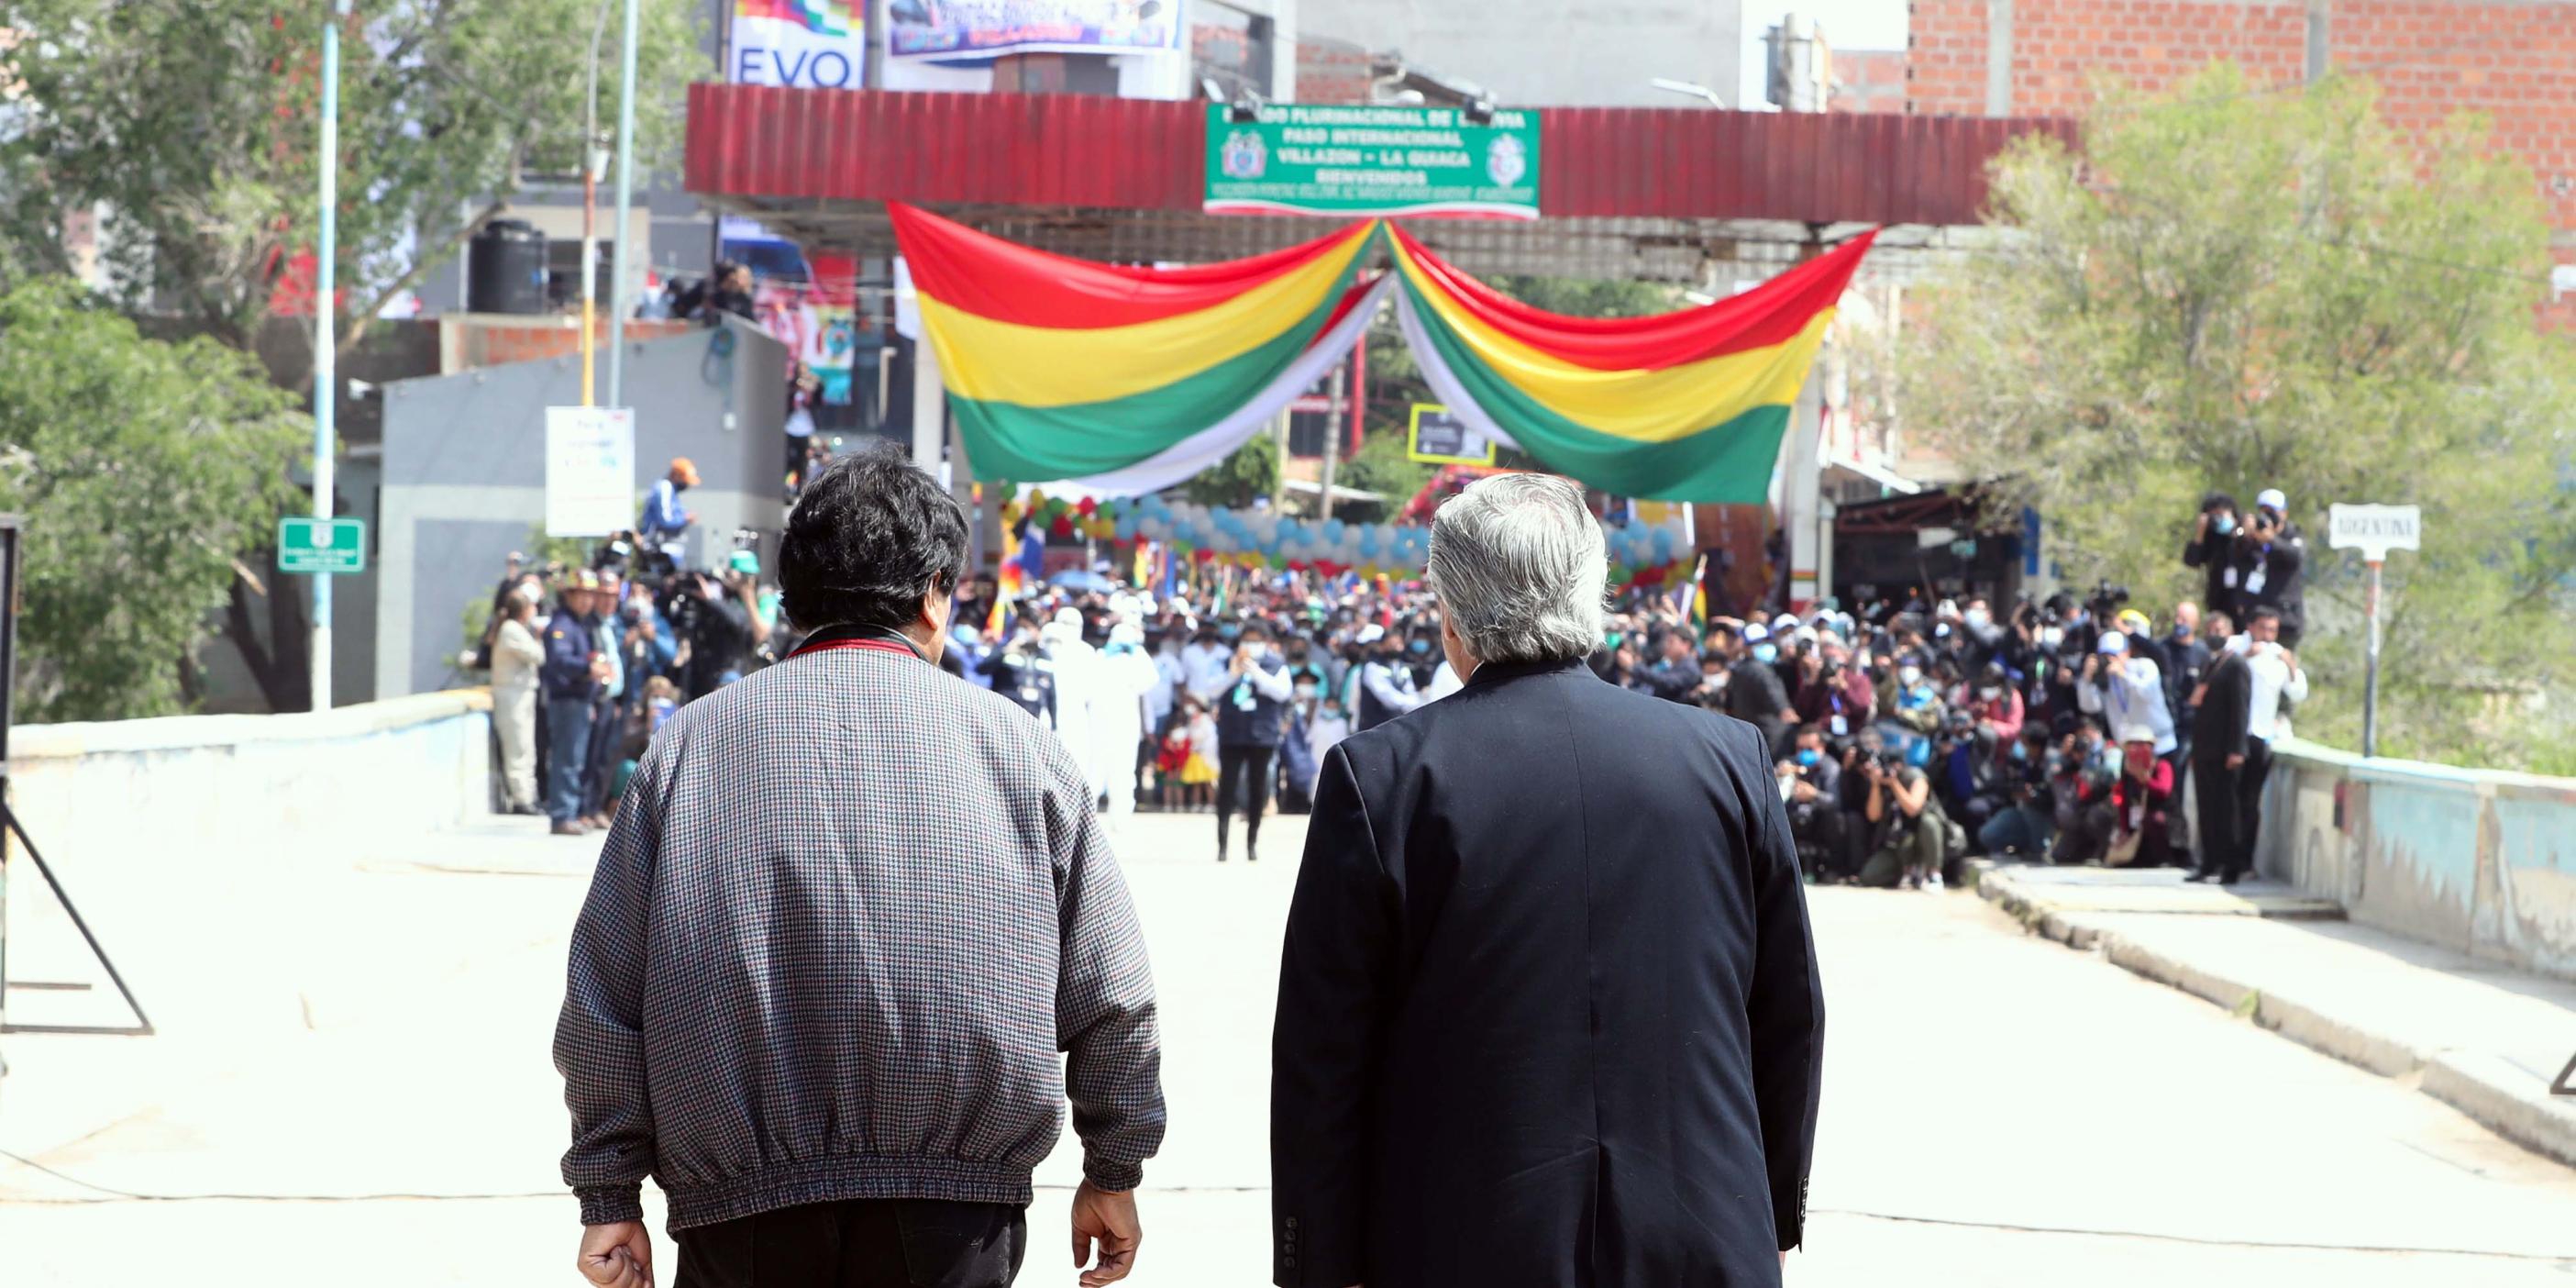 acompanado-alberto-fernandez-evo-morales-regreso-bolivia-